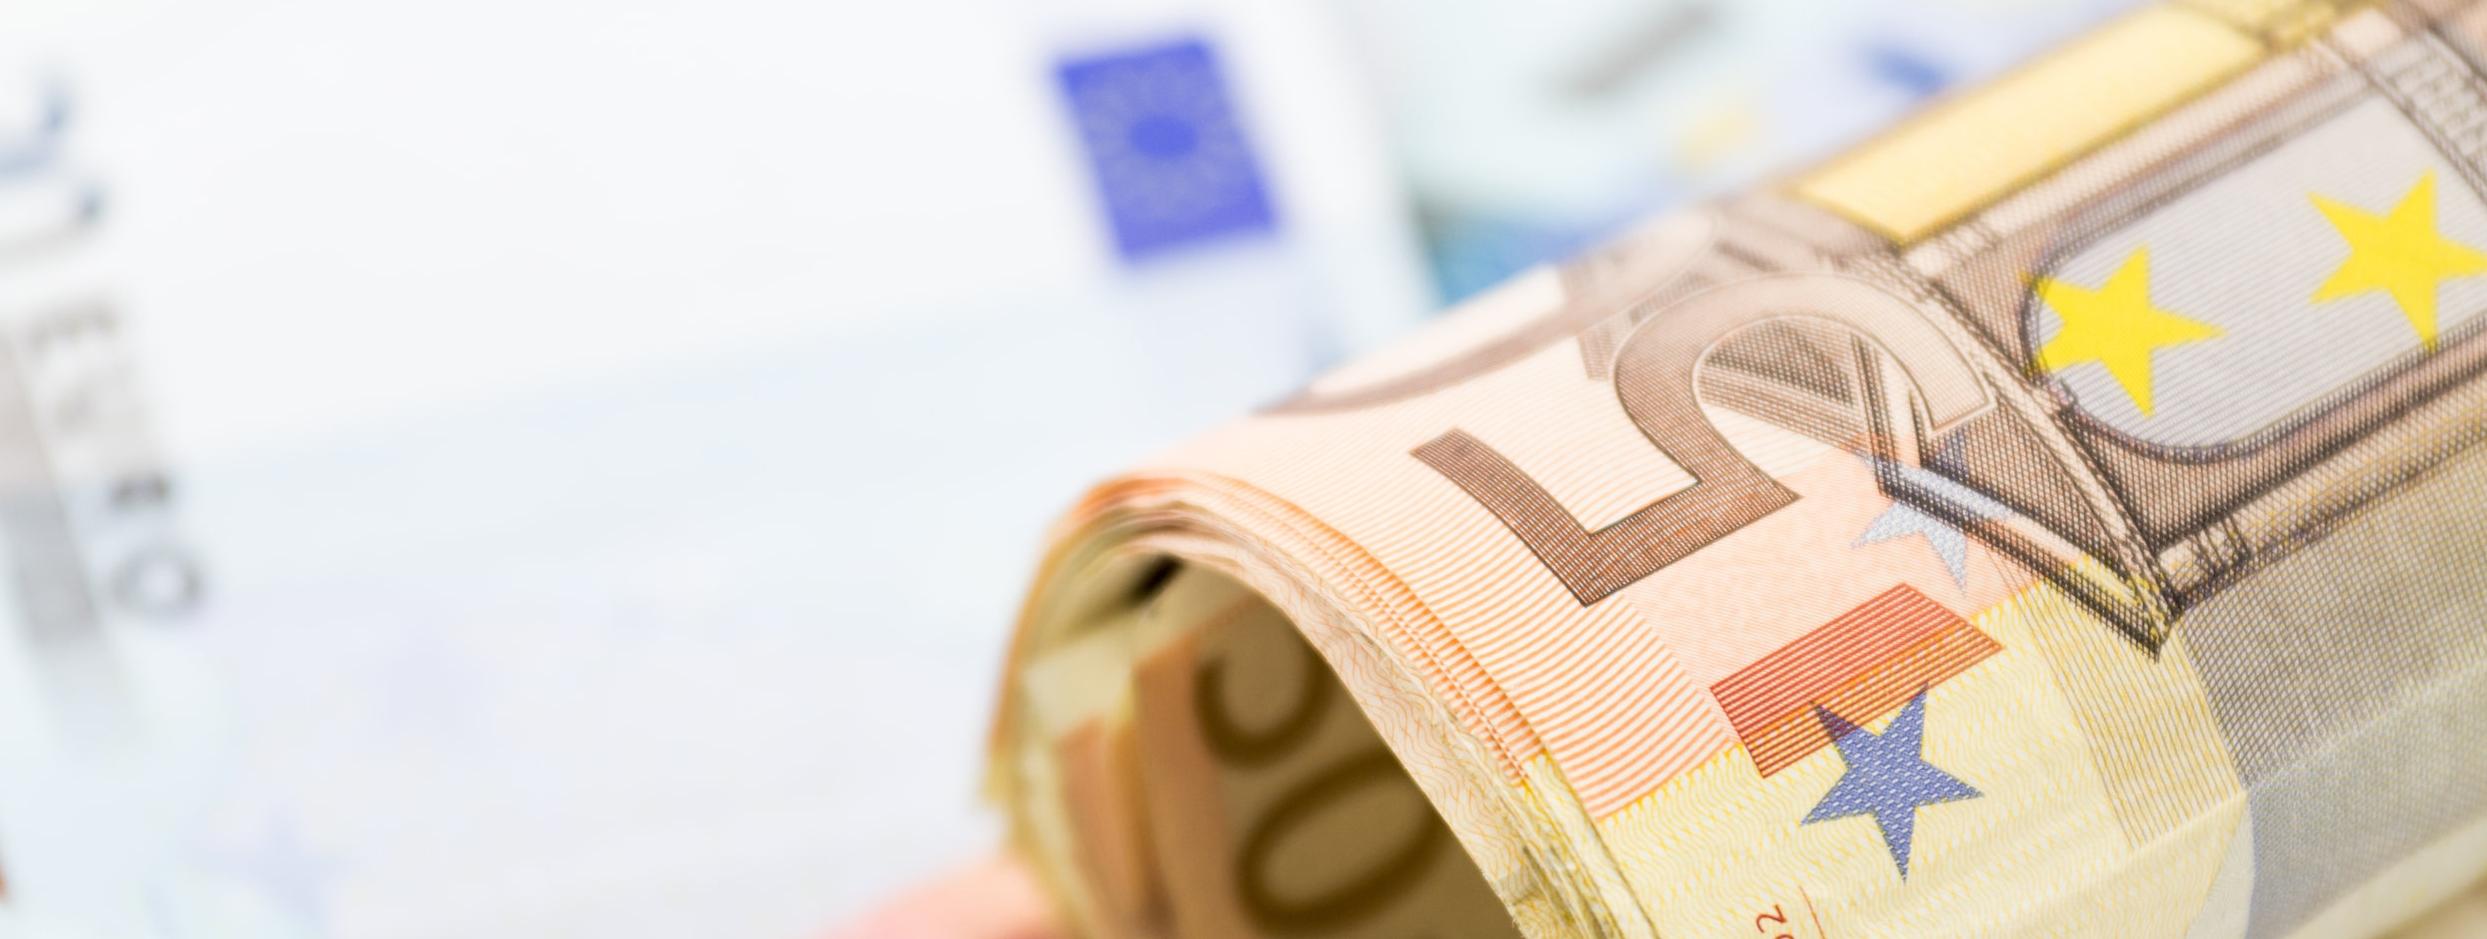 Euro Money.jpeg